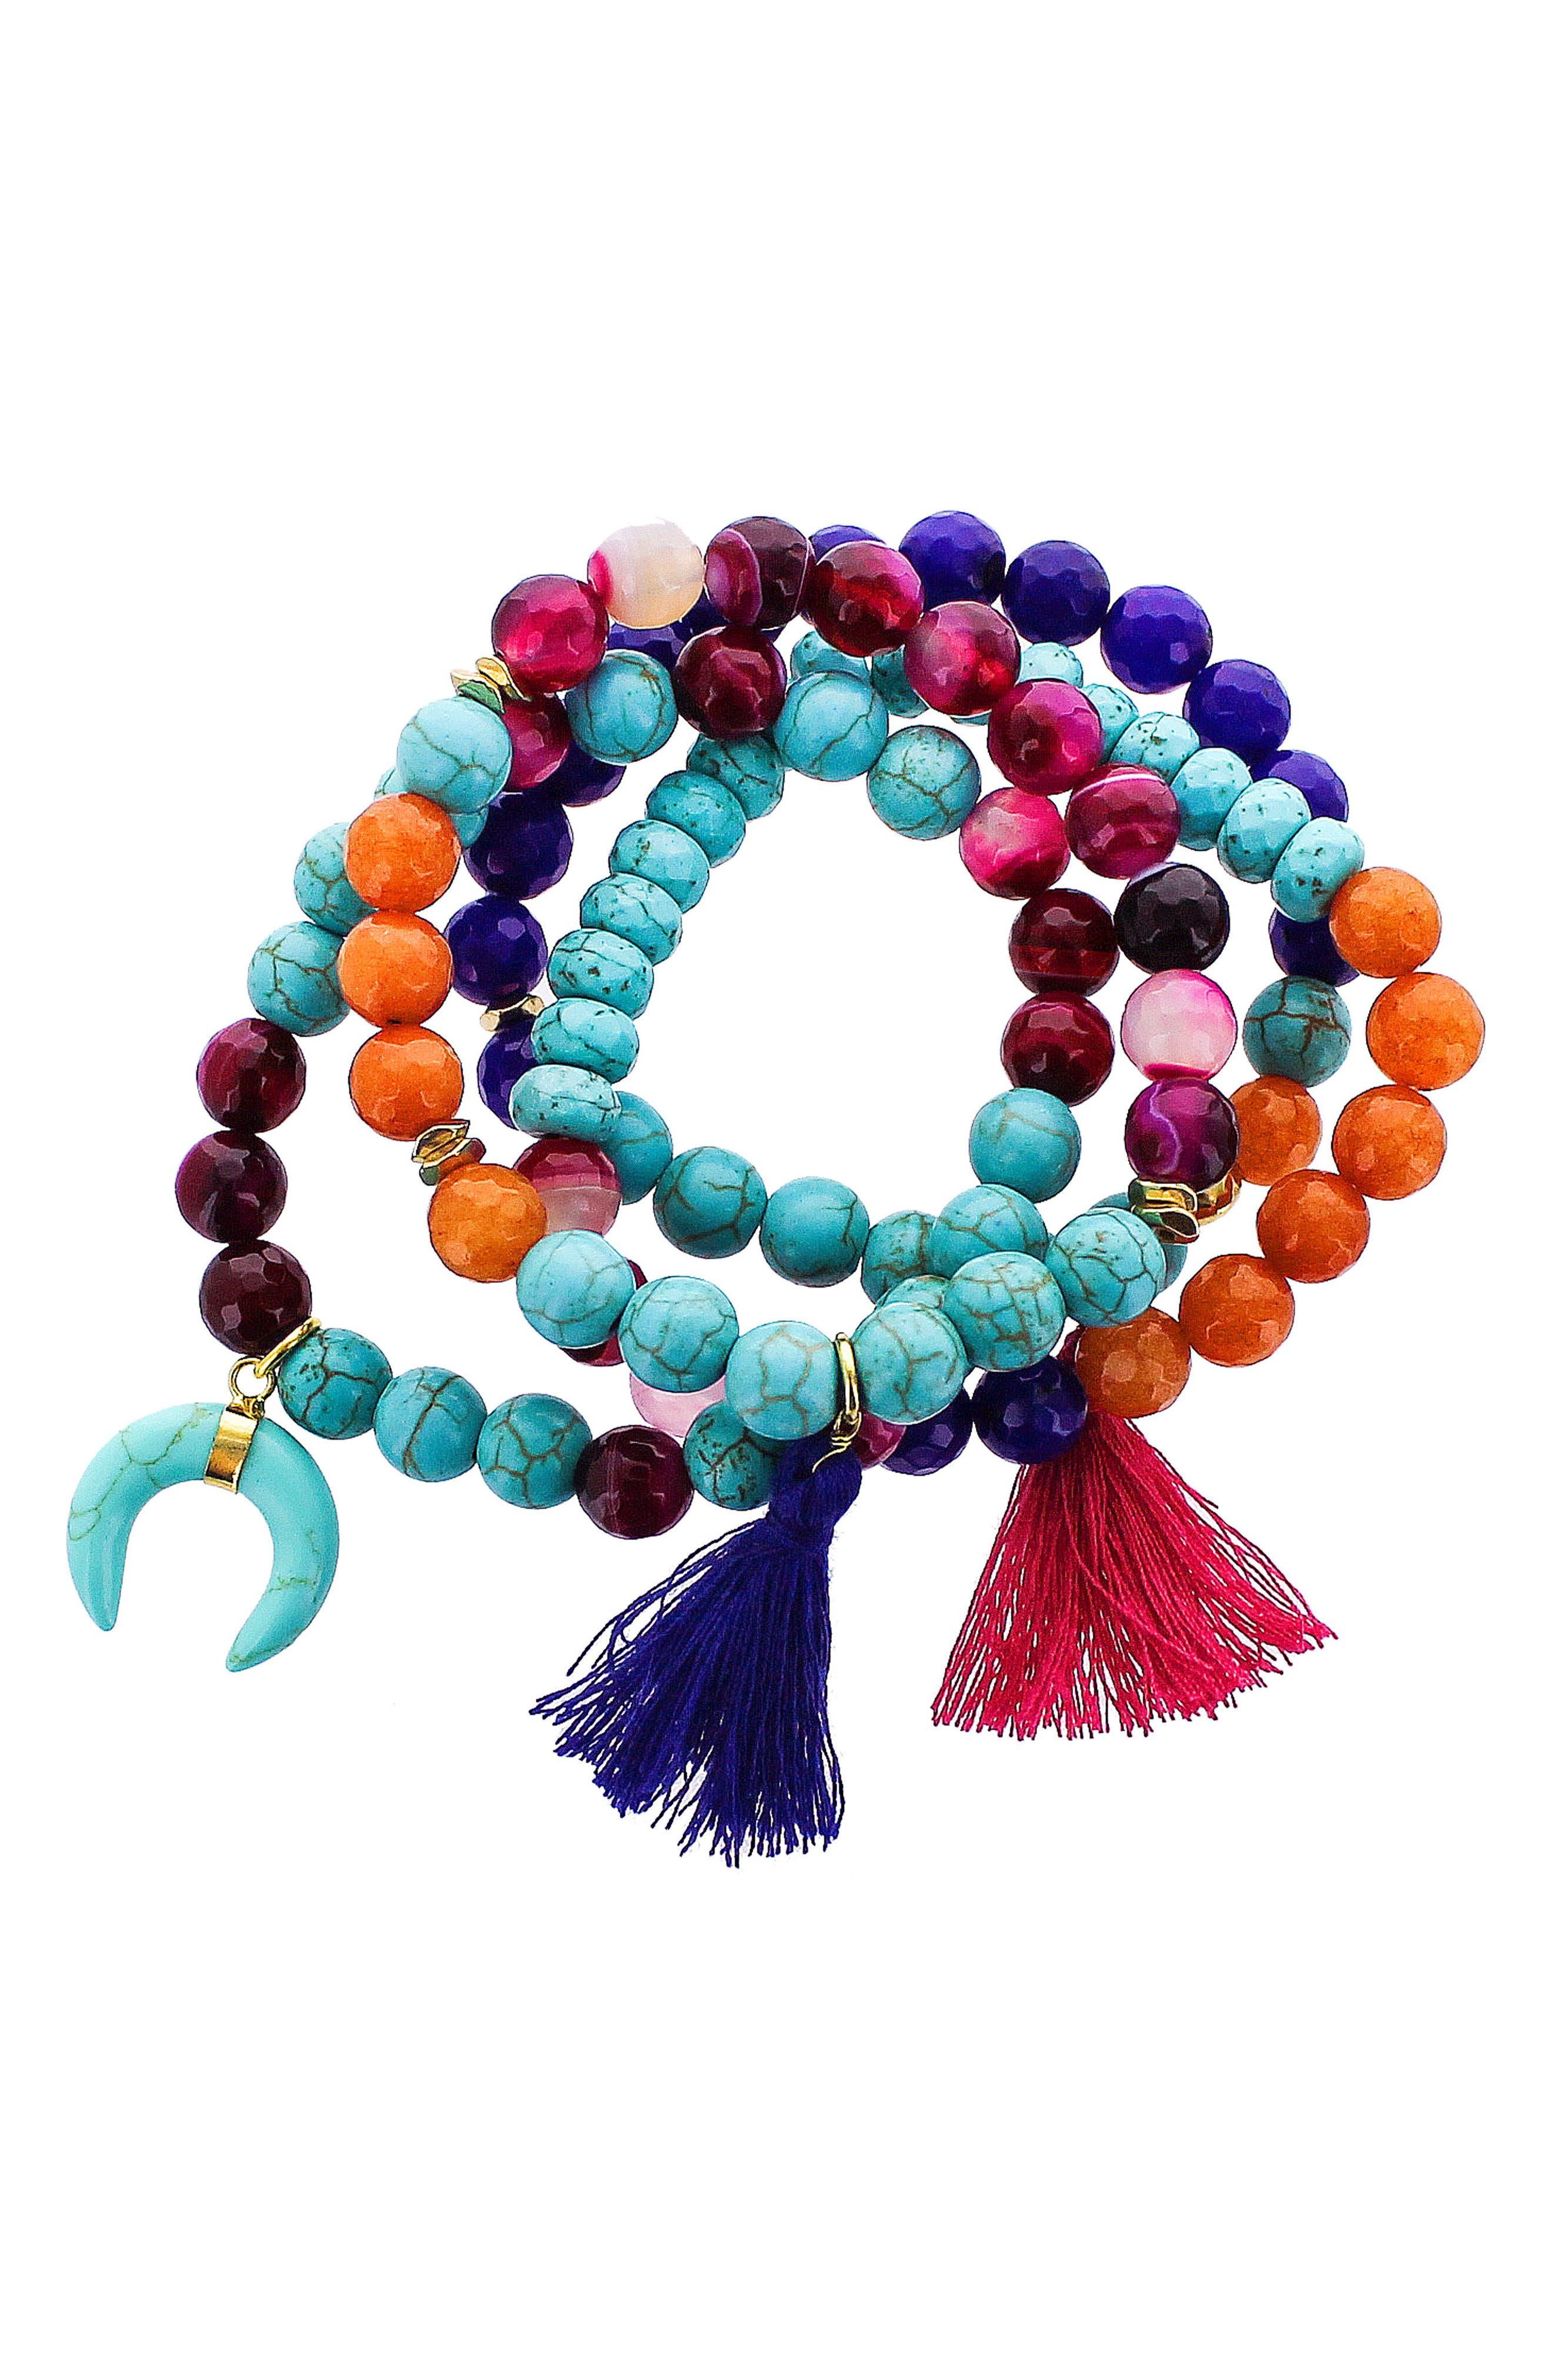 Set of 4 Beaded Stretch Bracelets,                             Main thumbnail 1, color,                             Turquoise/ Multi